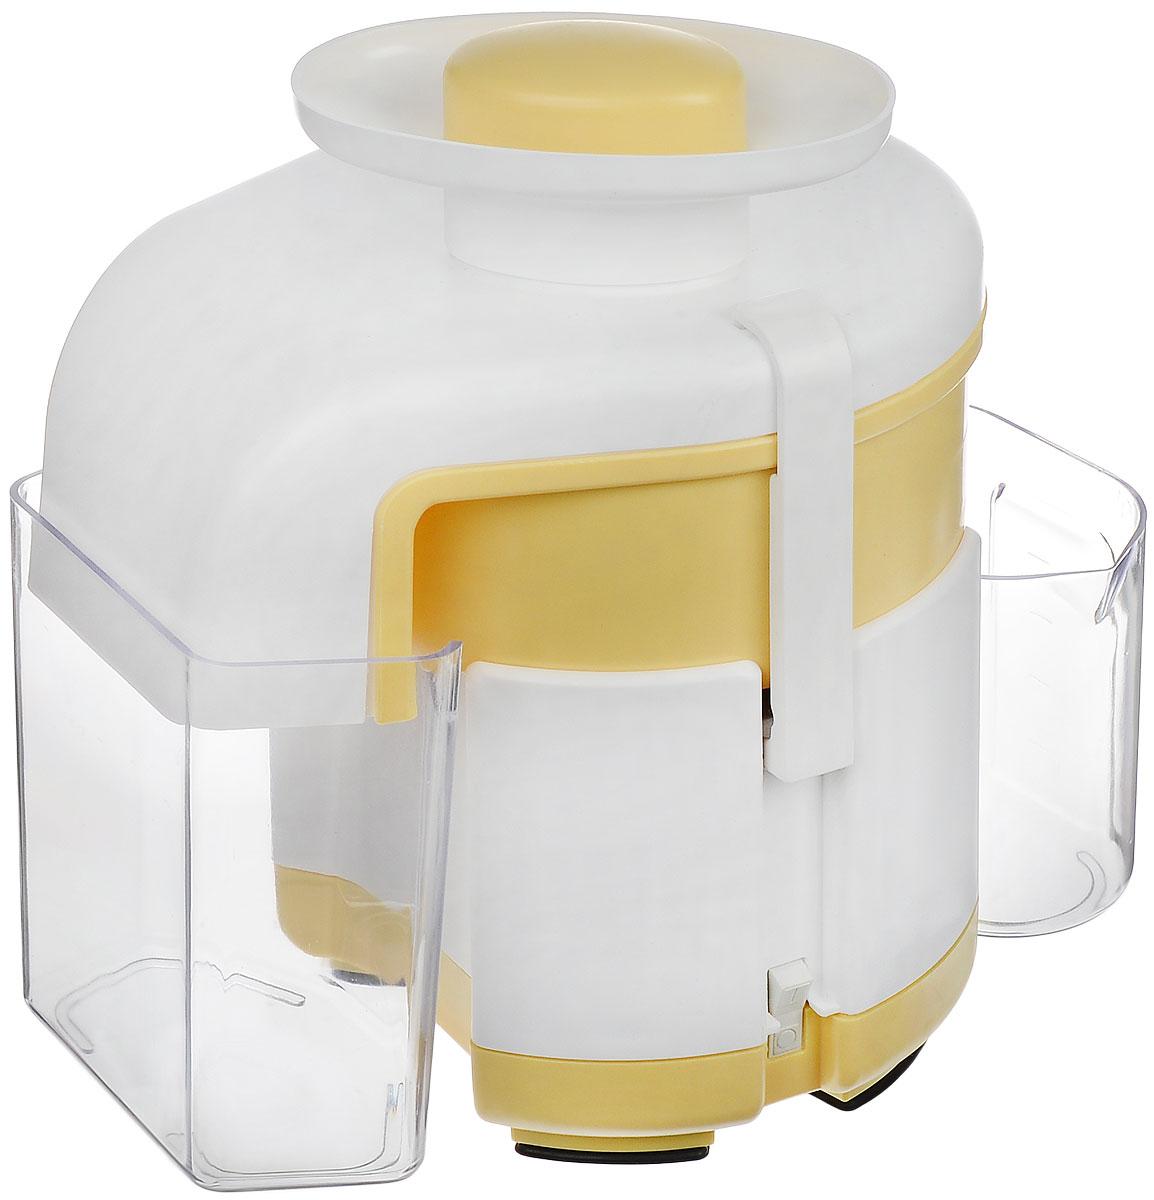 Журавинка СВСП 102 П, White Yellow соковыжималка СК СВСП 102П